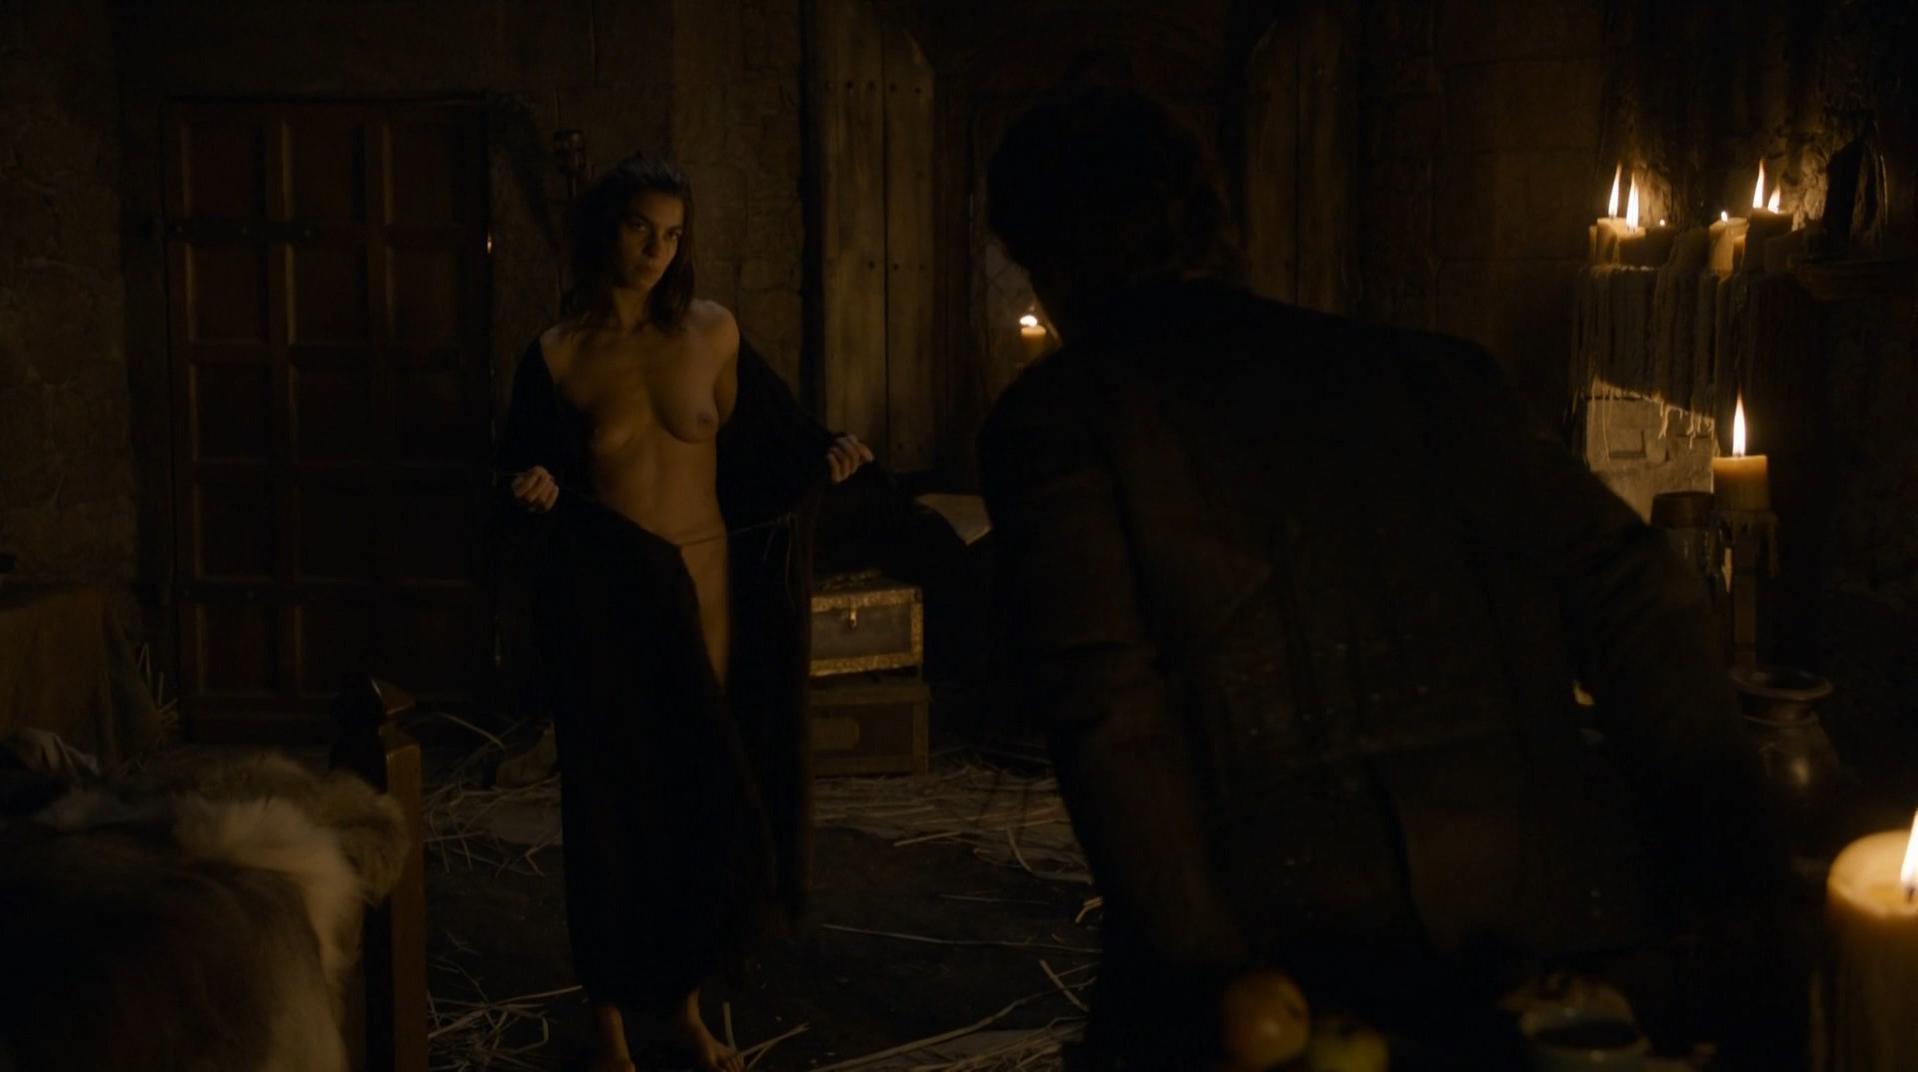 ... Natalia Tena nude - Game of Thrones s02e06 (2012) ...